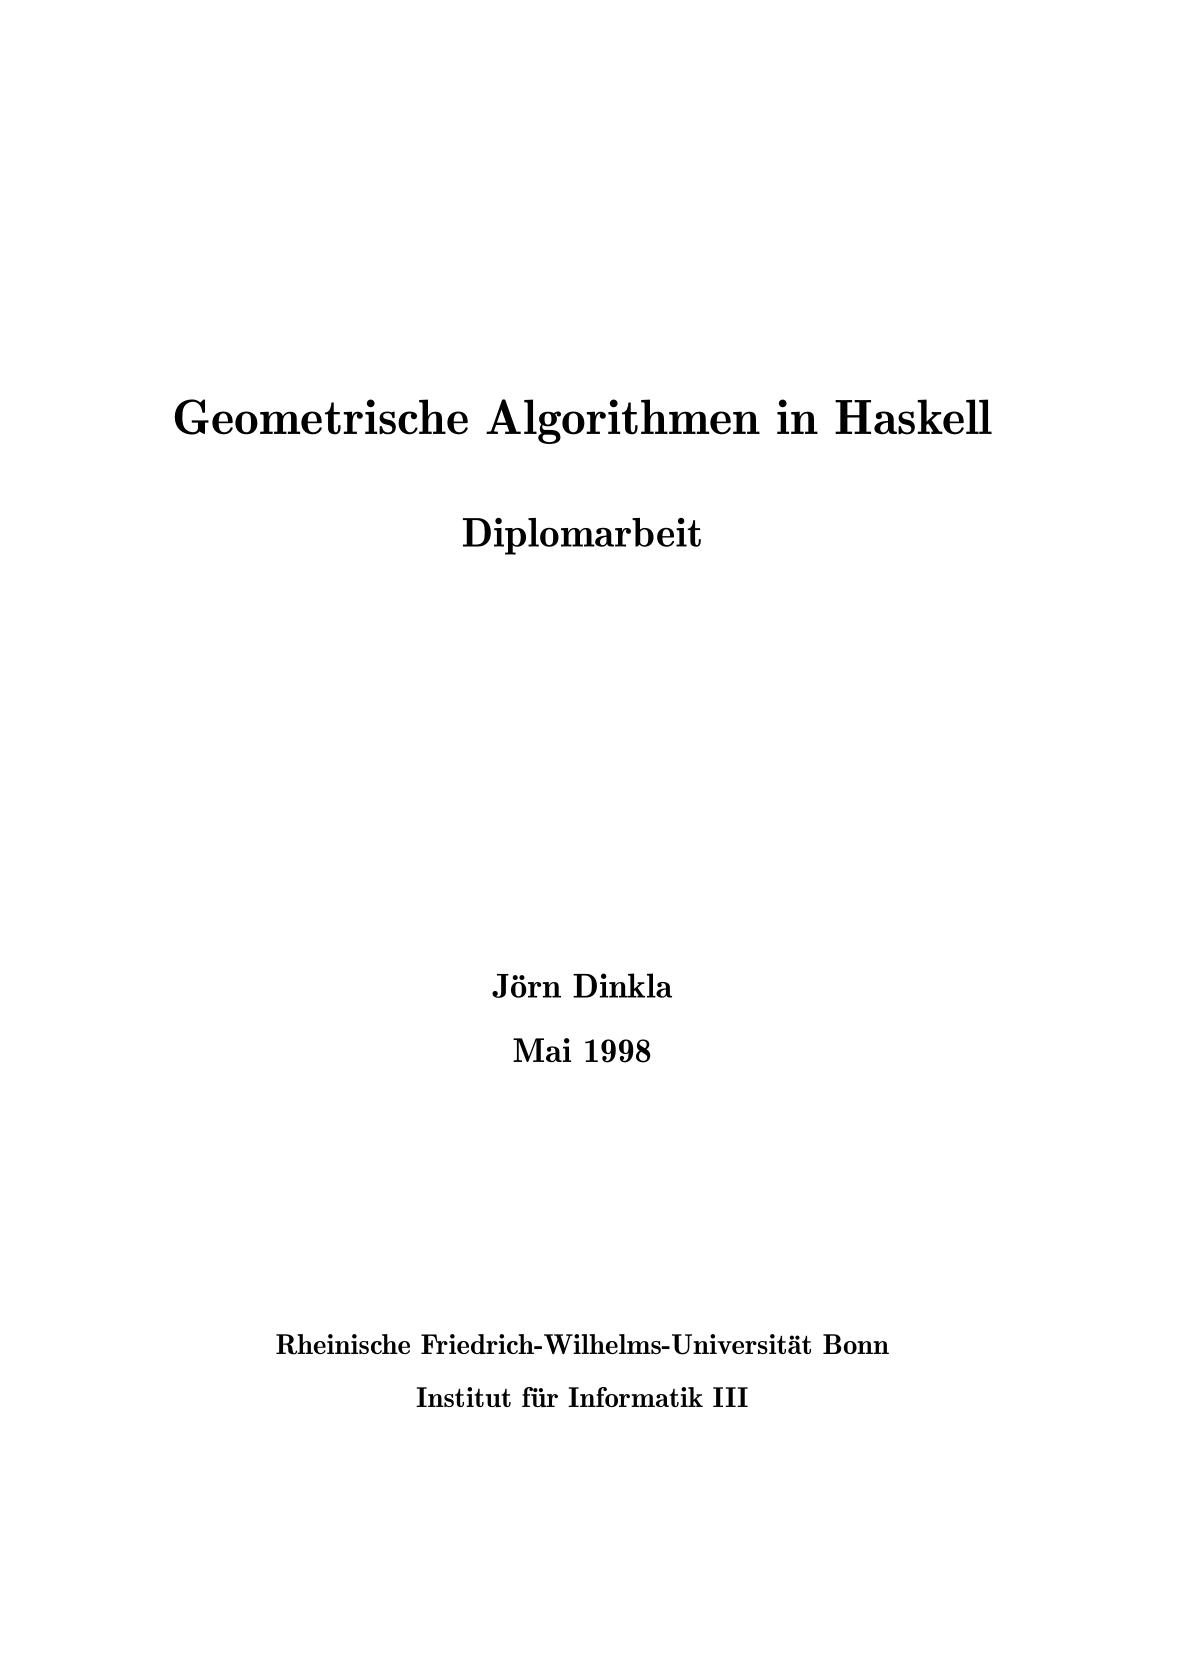 Geometrische Algorithmen in Haskell